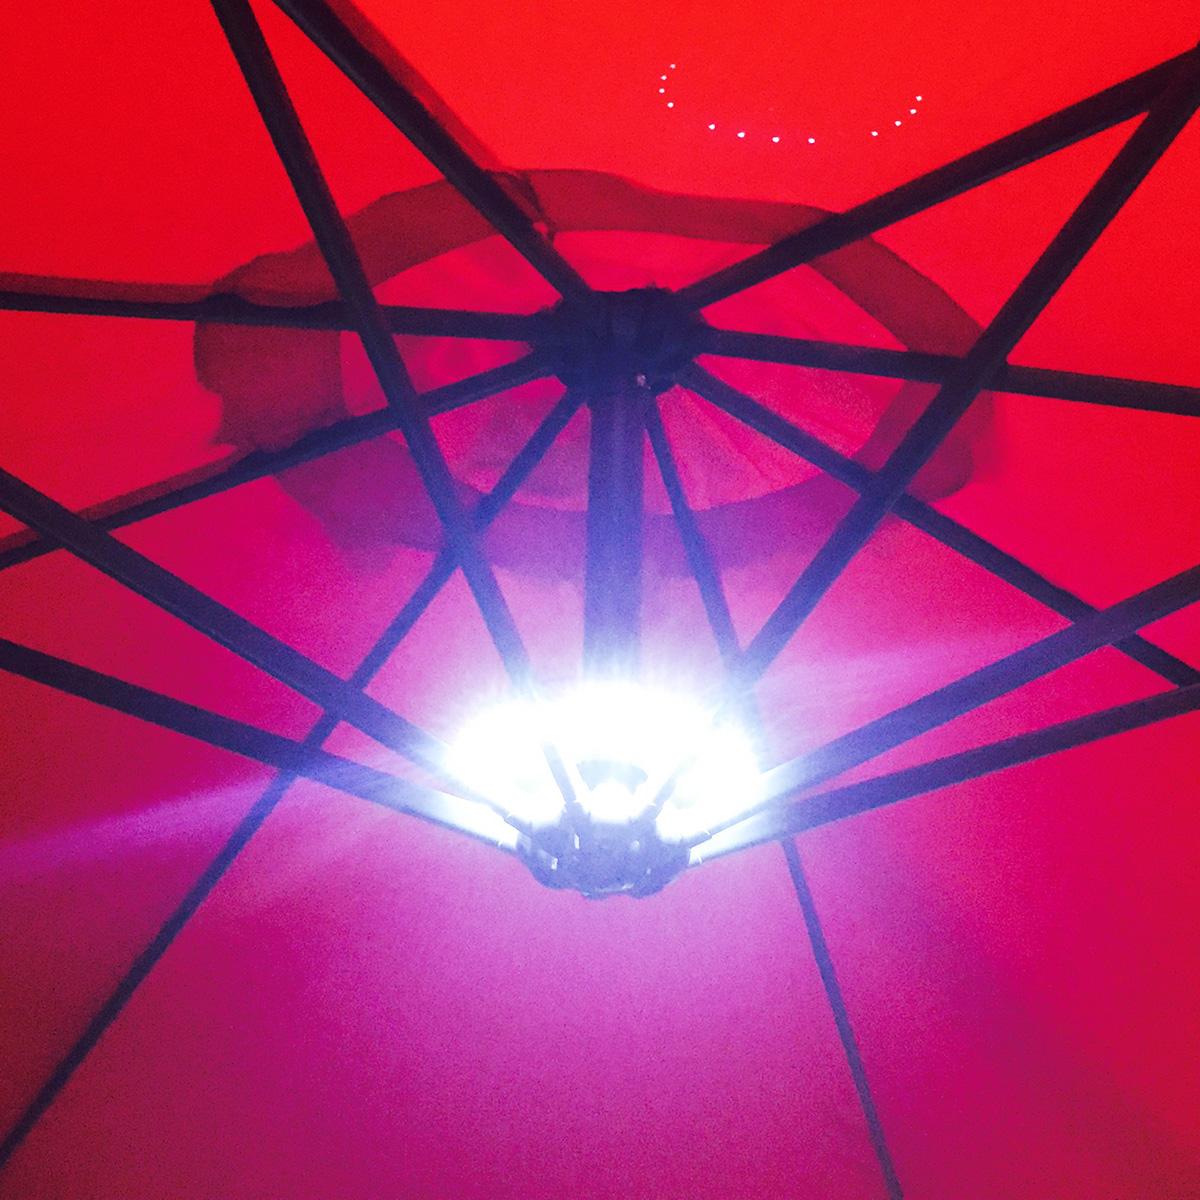 Led Lights For Patio Umbrella : Sunshade Umbrella Patio Outdoor LED Night Light Cordless Table Mount